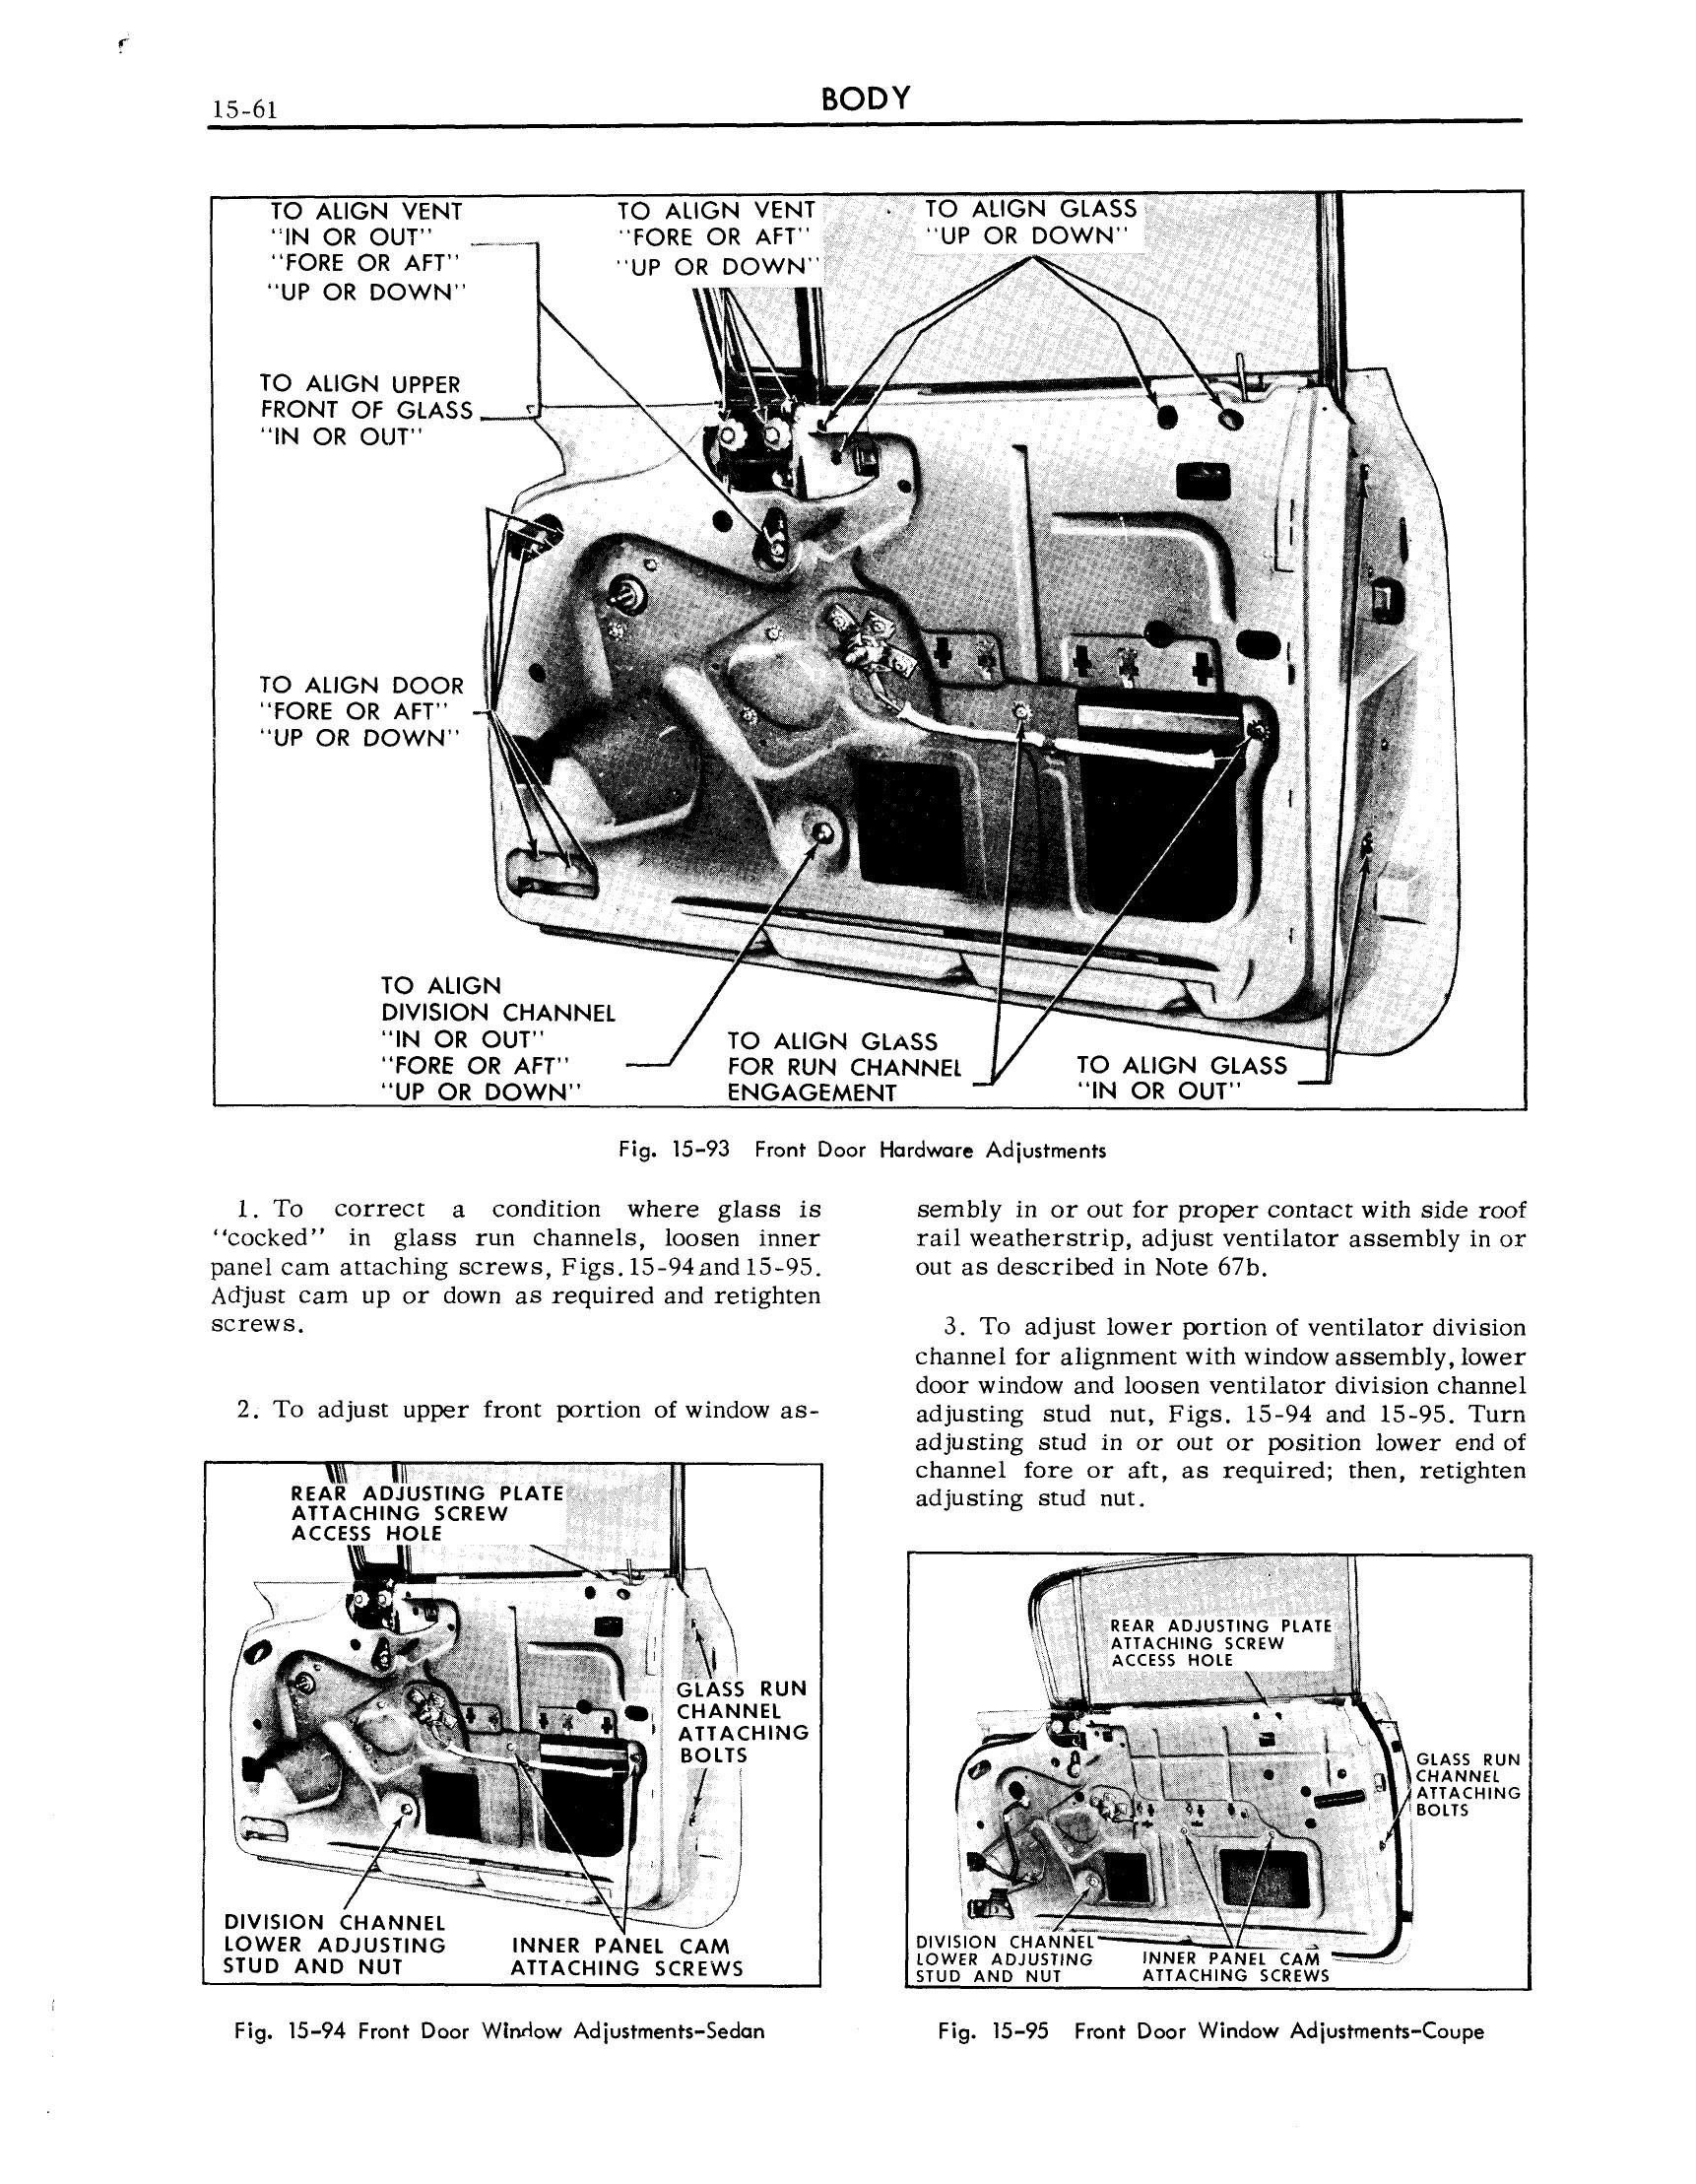 1959 Cadillac Shop Manual- Body Page 61 of 99